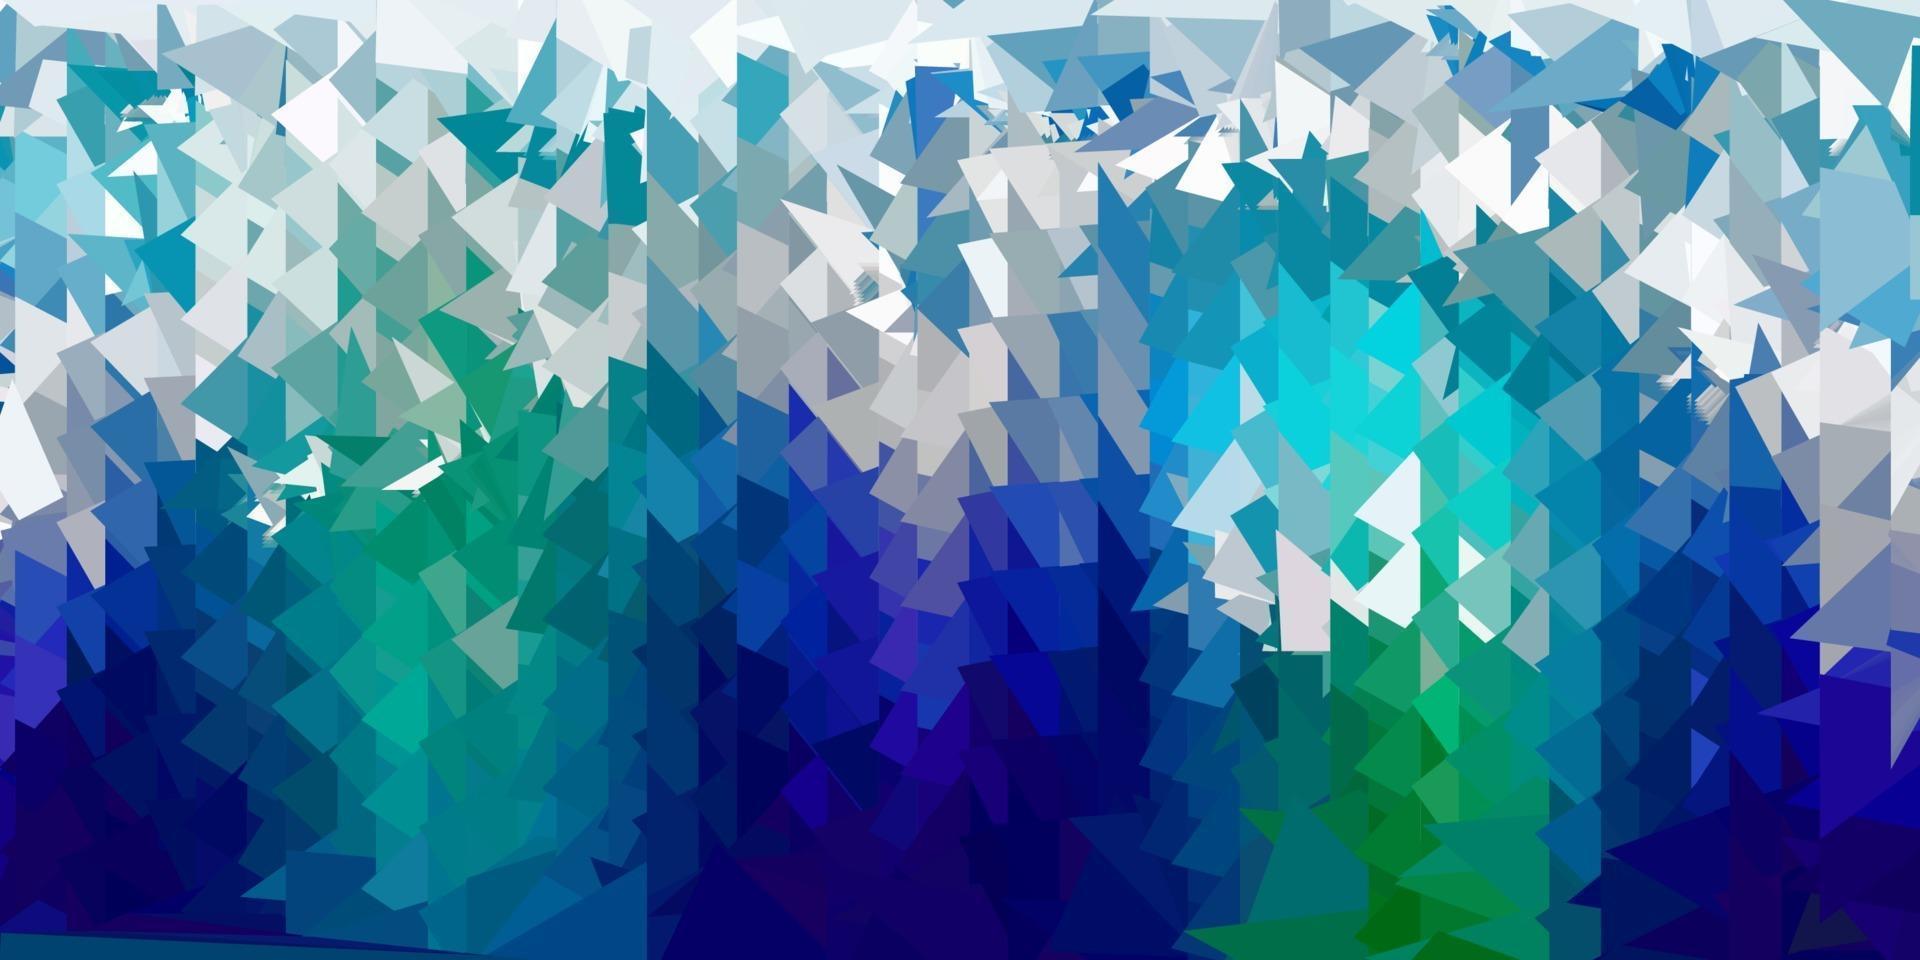 layout poligono gradiente vettoriale blu scuro, verde.